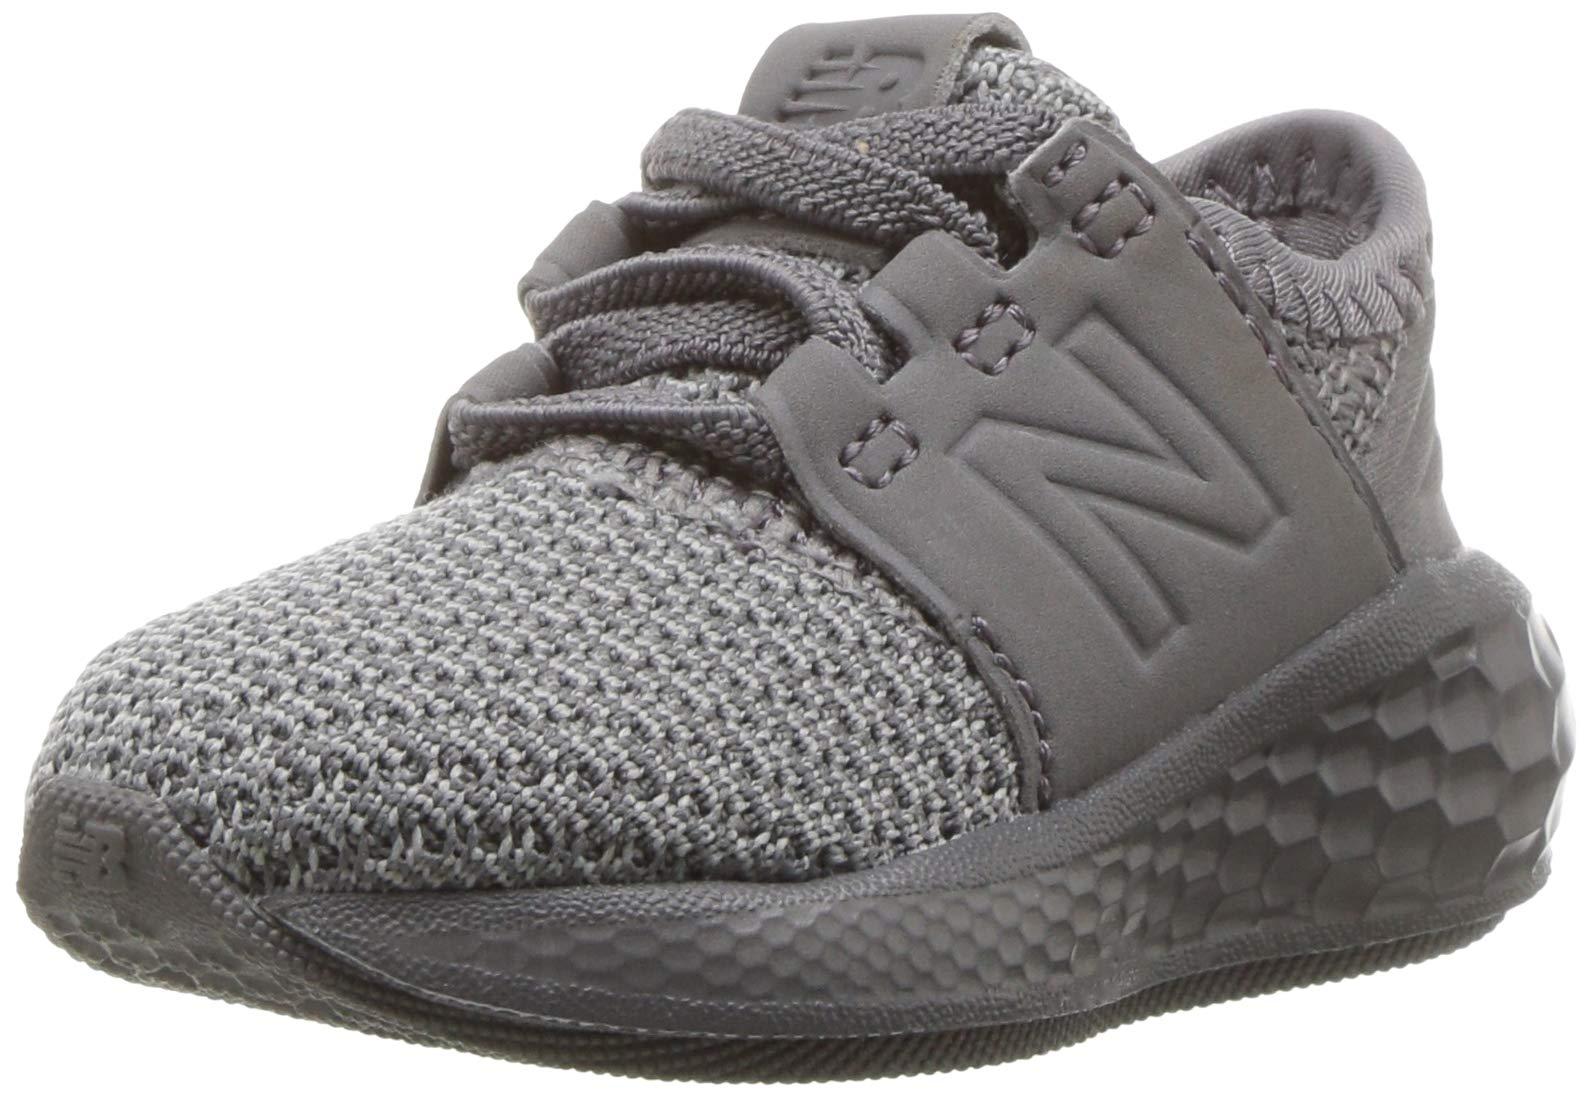 New Balance Boys' Cruz V2 Fresh Foam Running Shoe, Team Away Grey, 5.5 M US Toddler